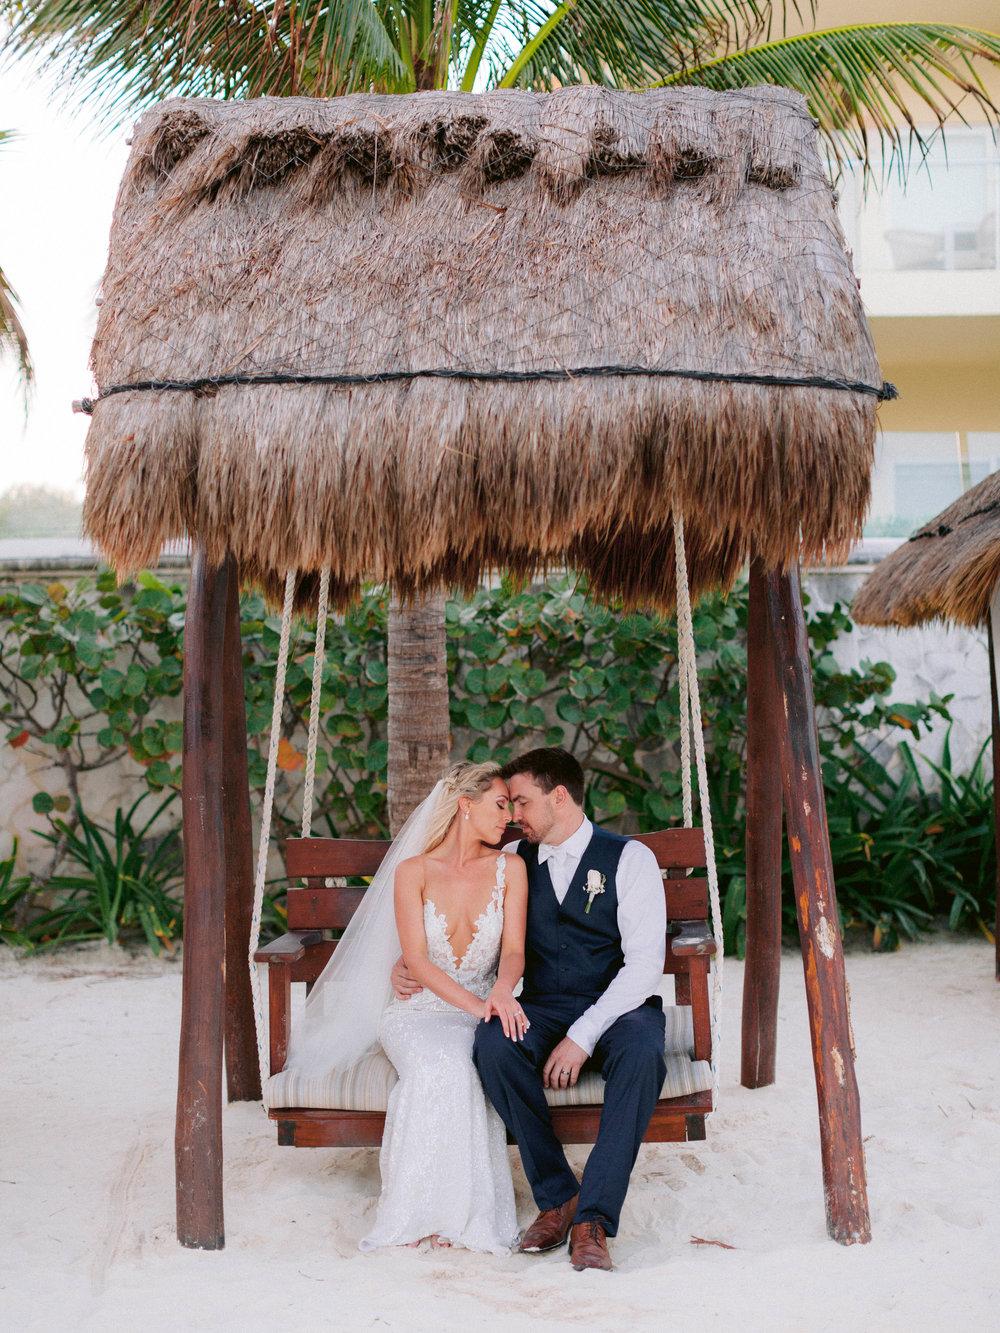 Kim_Jeff_Cancun Wedding_Portraits_Kurtz_Orpia (165 of 178).jpg